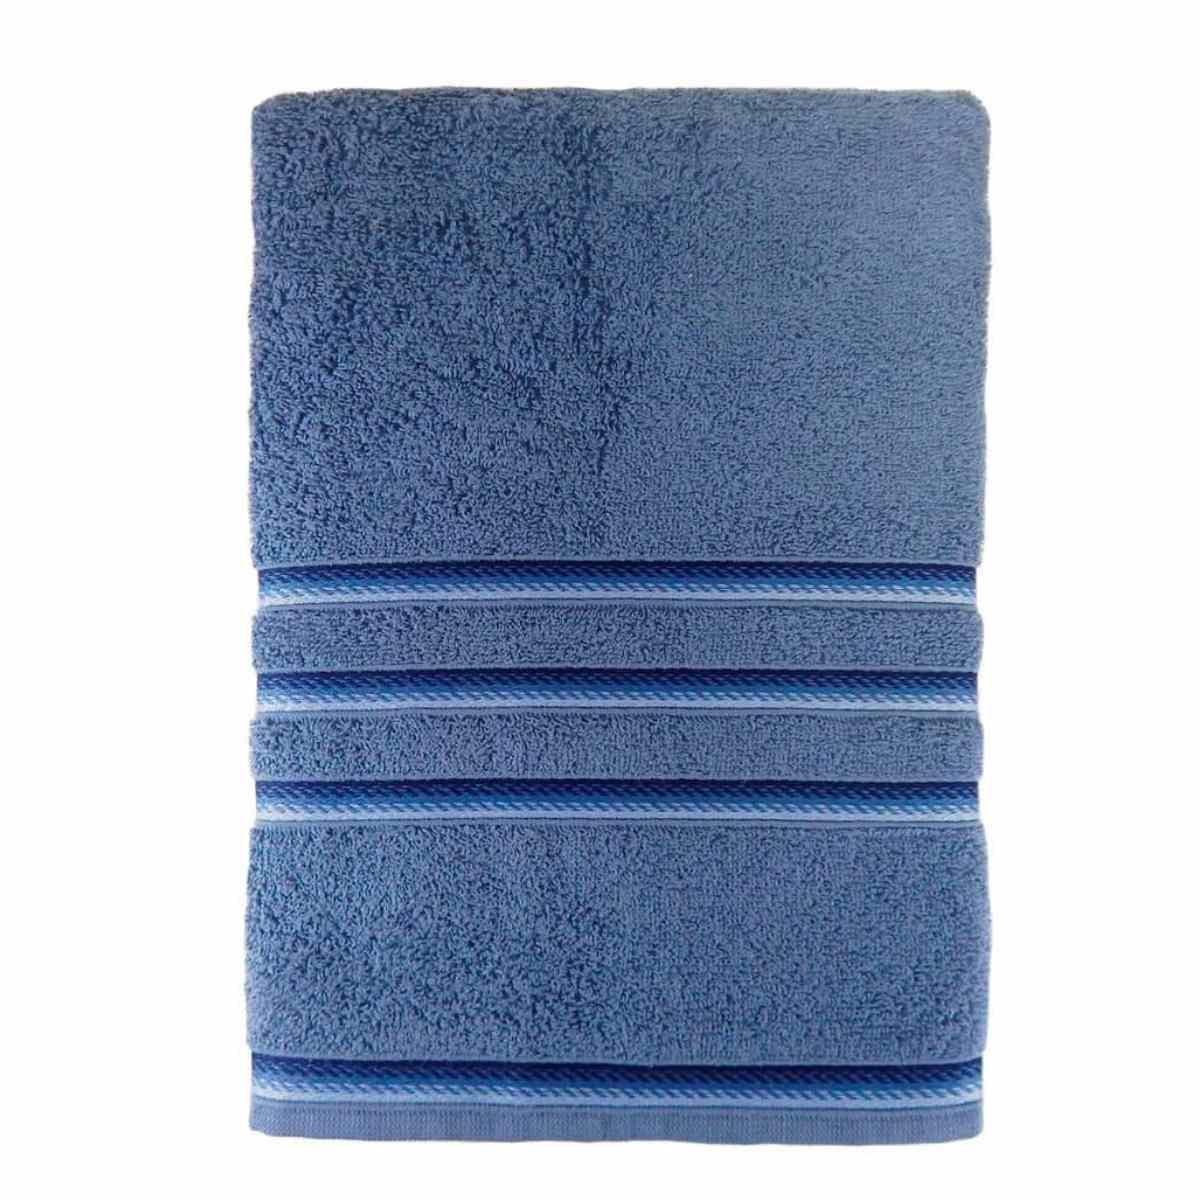 Toalha rosto classic 45x68 Azul Infinity